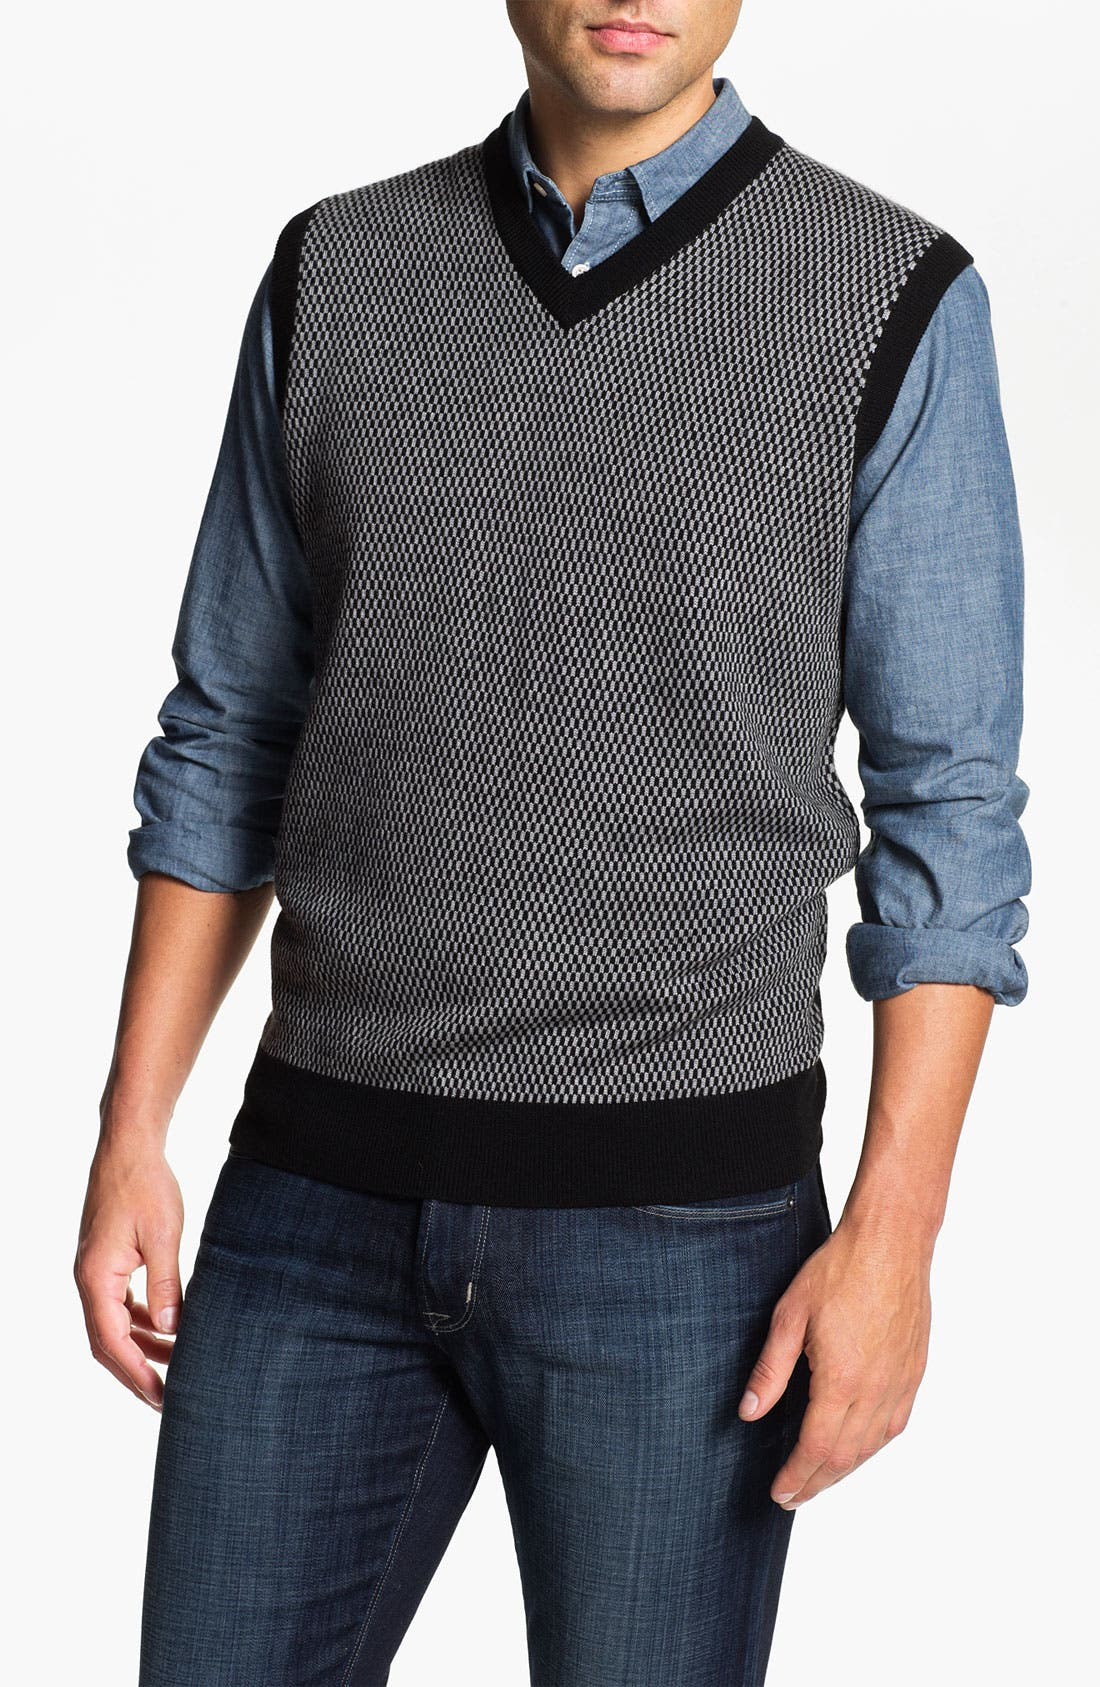 Main Image - Toscano Merino Wool Blend Sweater Vest